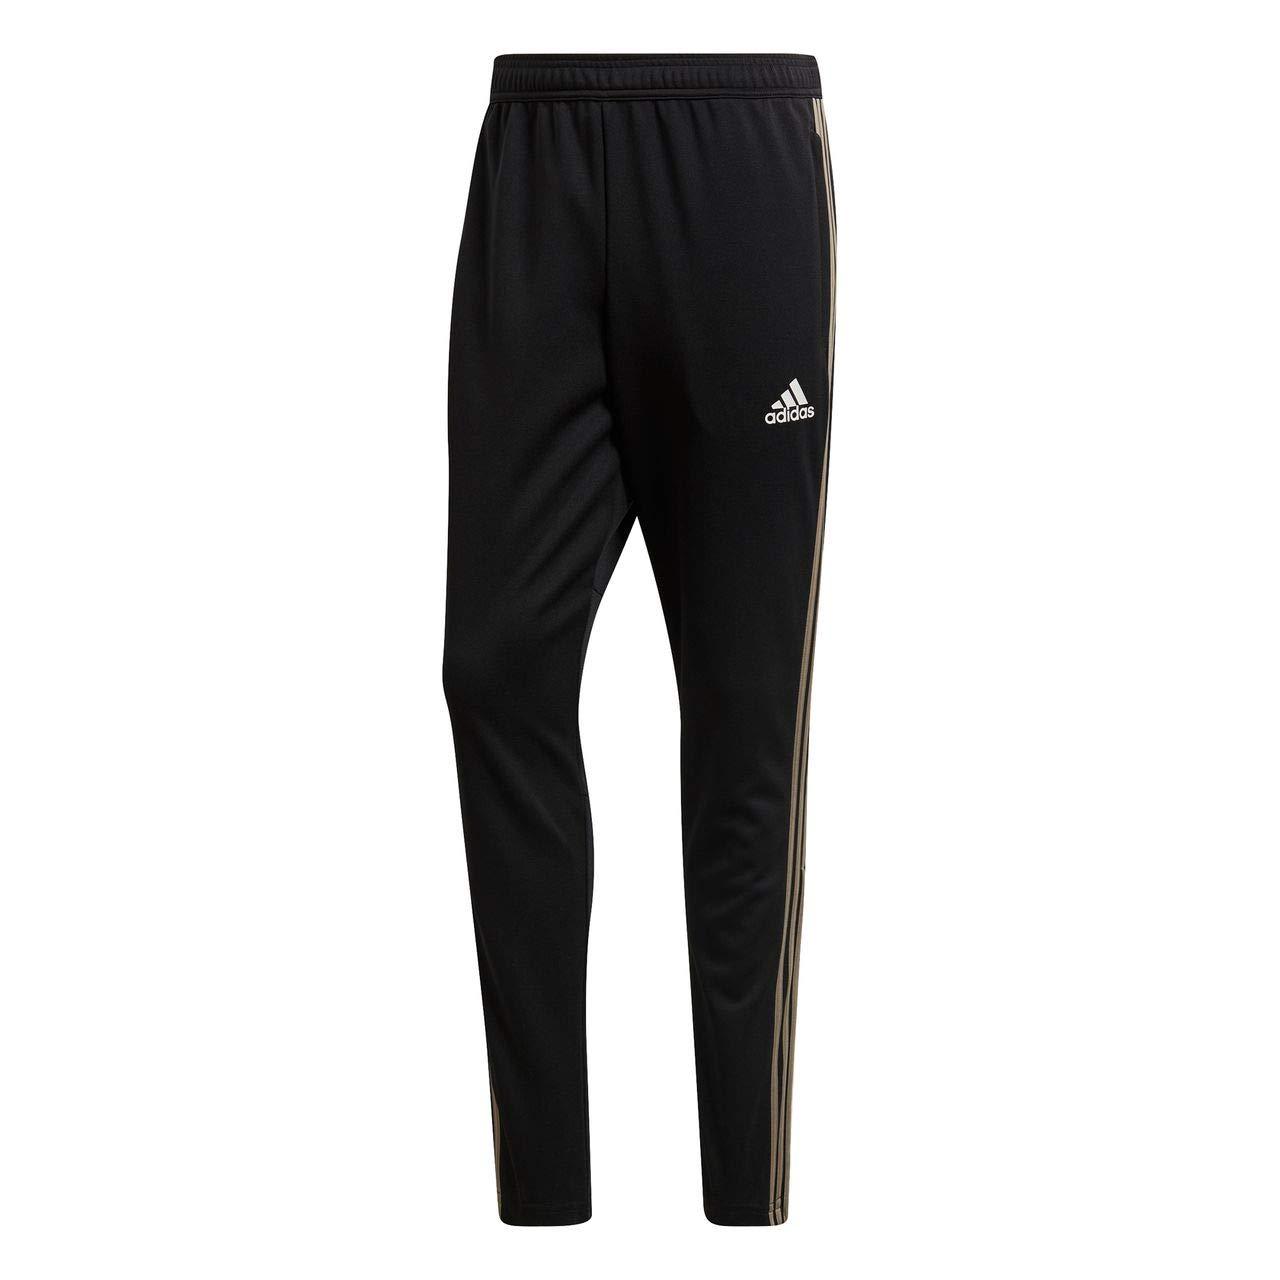 Adidas Herren Juve Training Hose